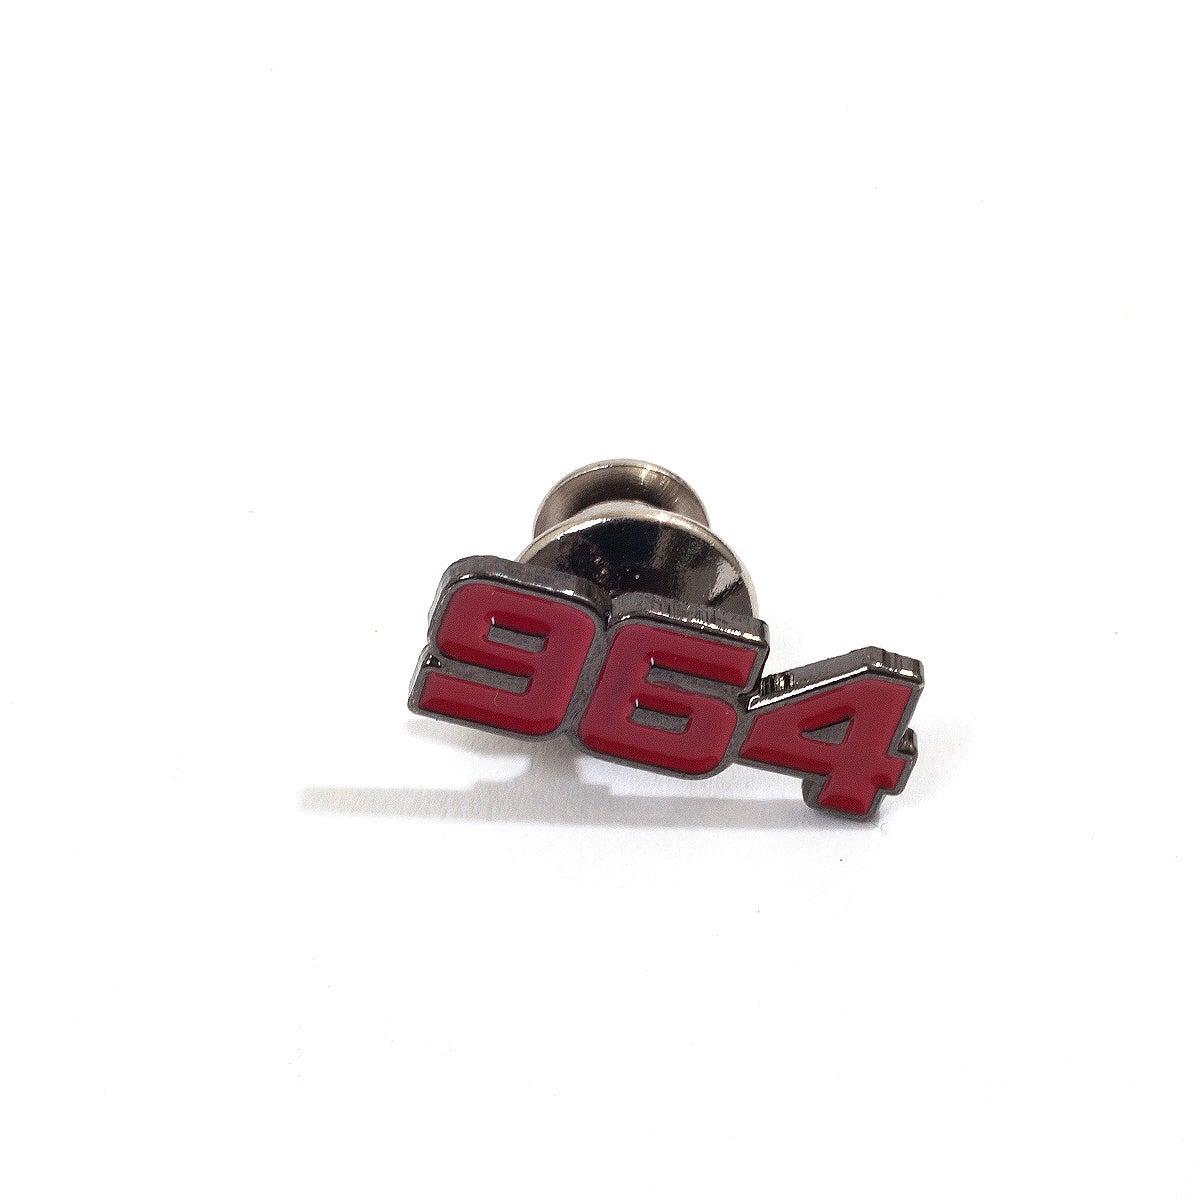 Image of 964 Pin